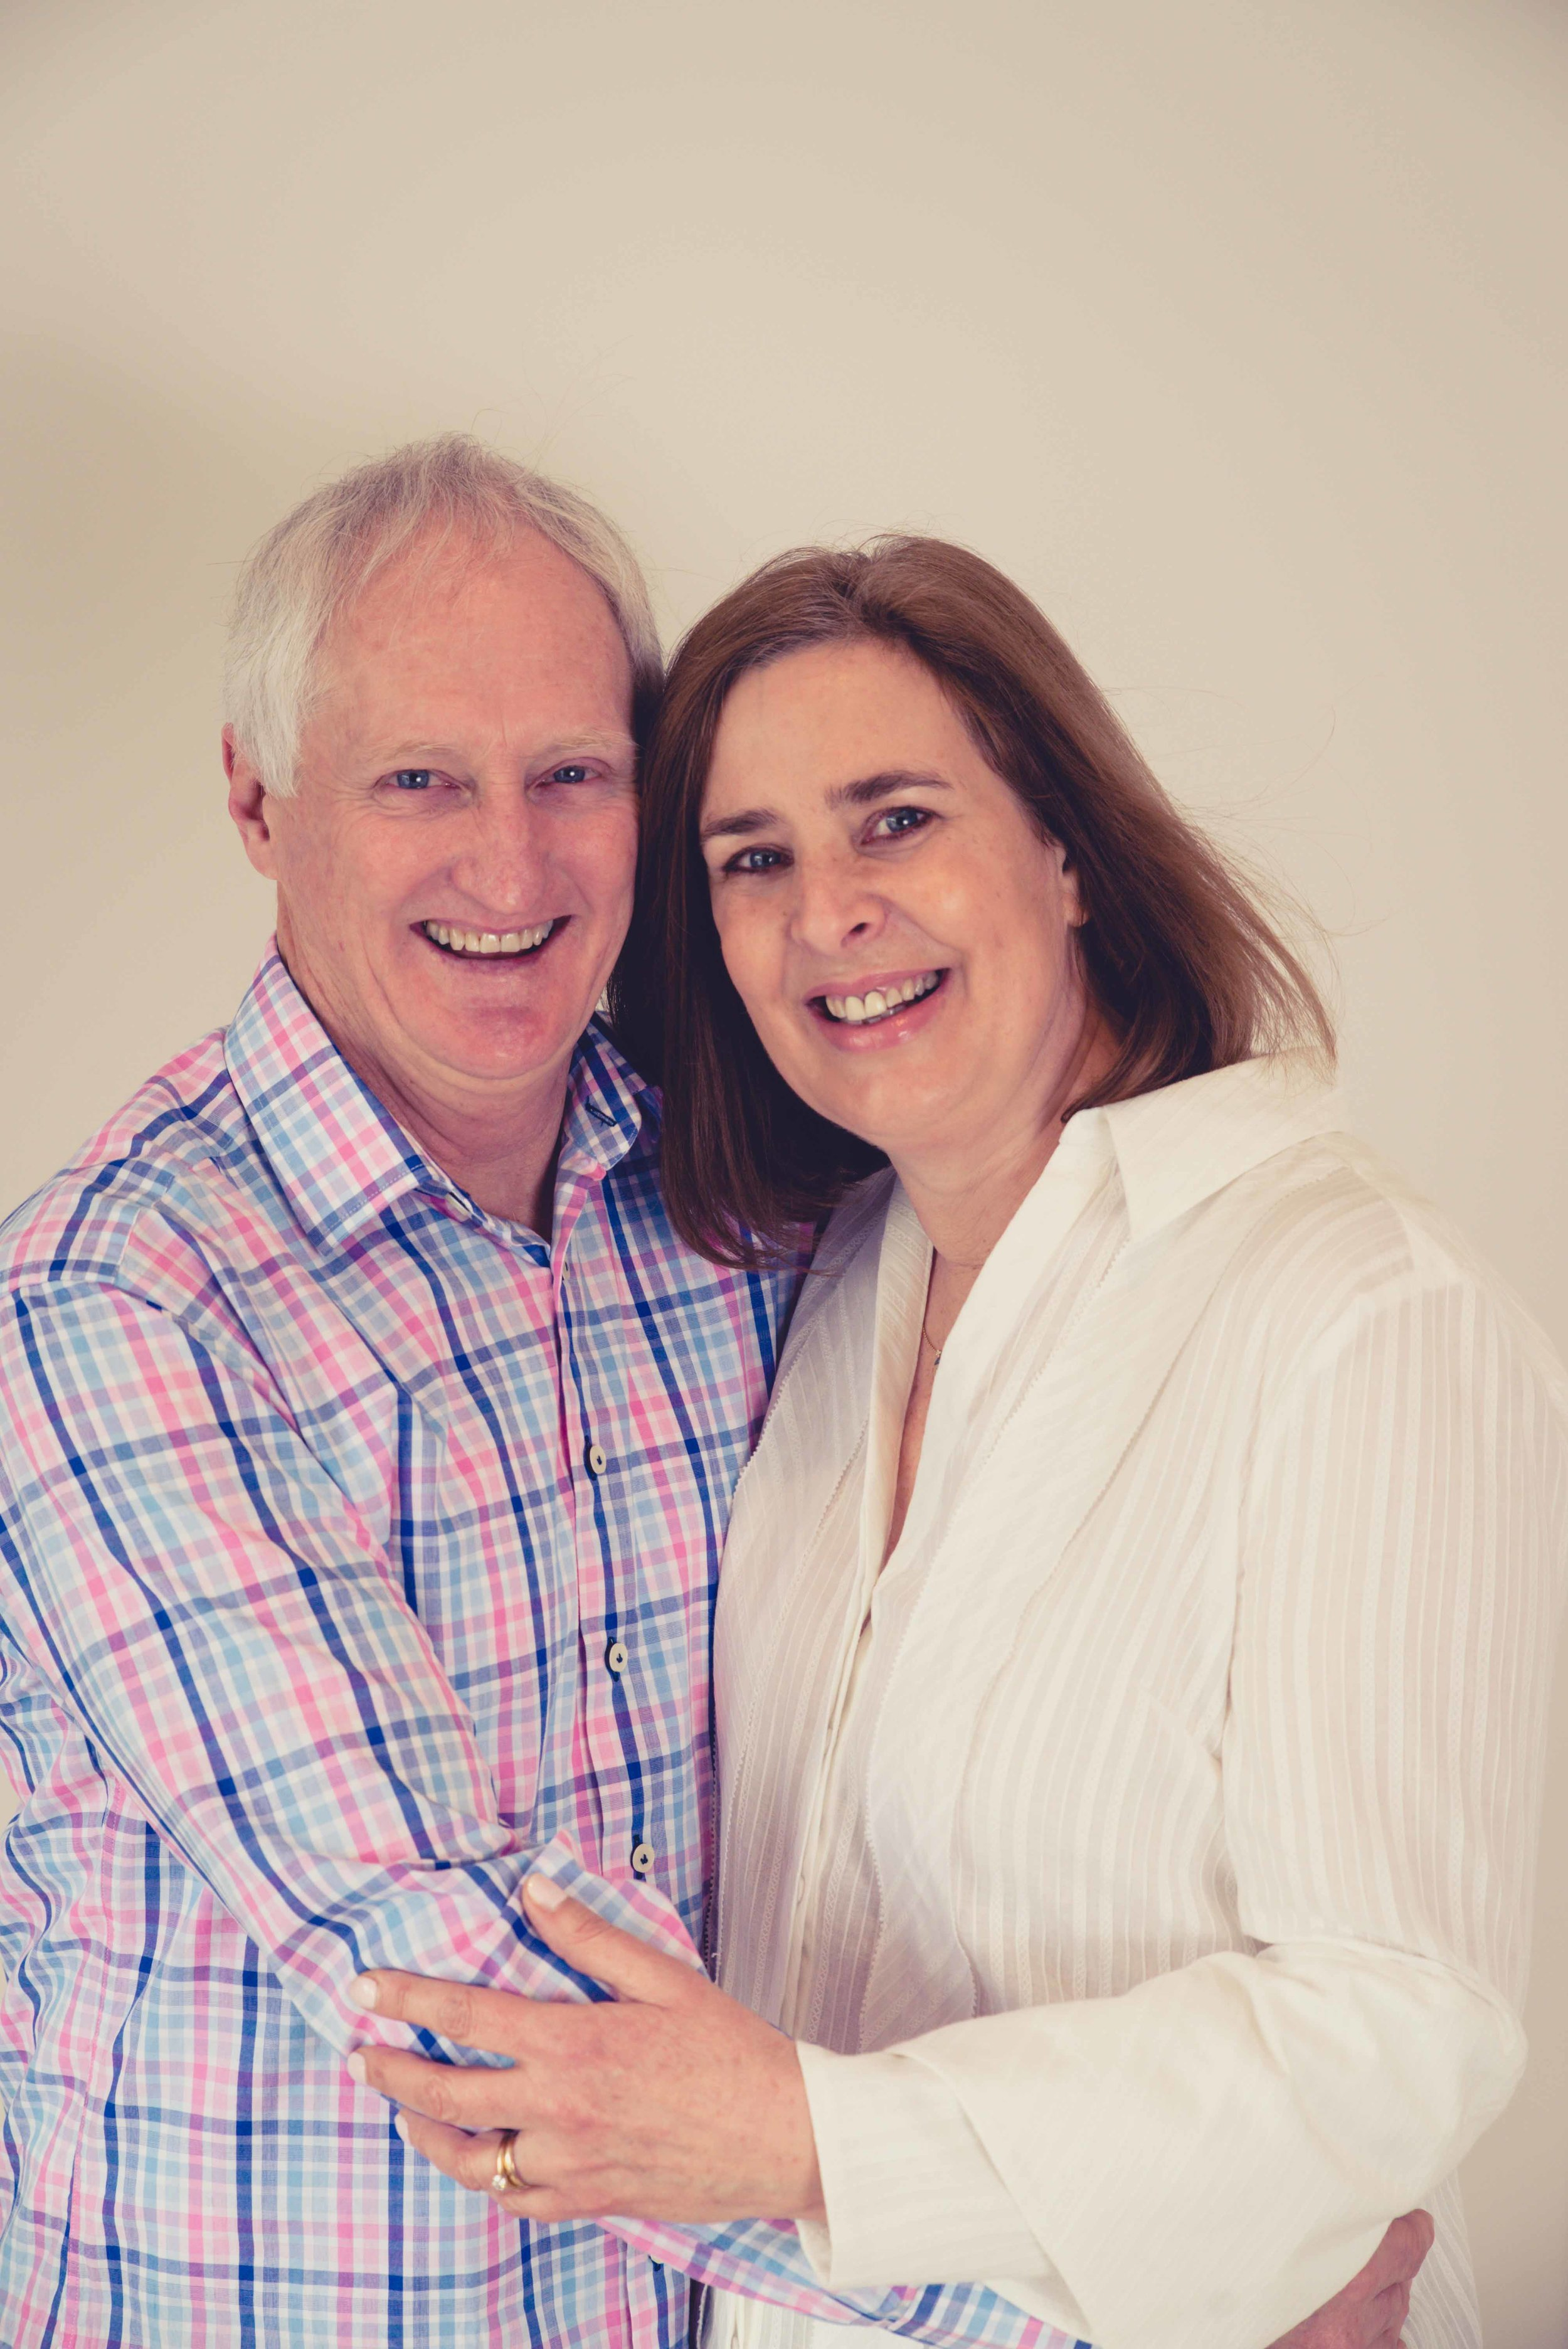 anniversary gift idea couple auckland